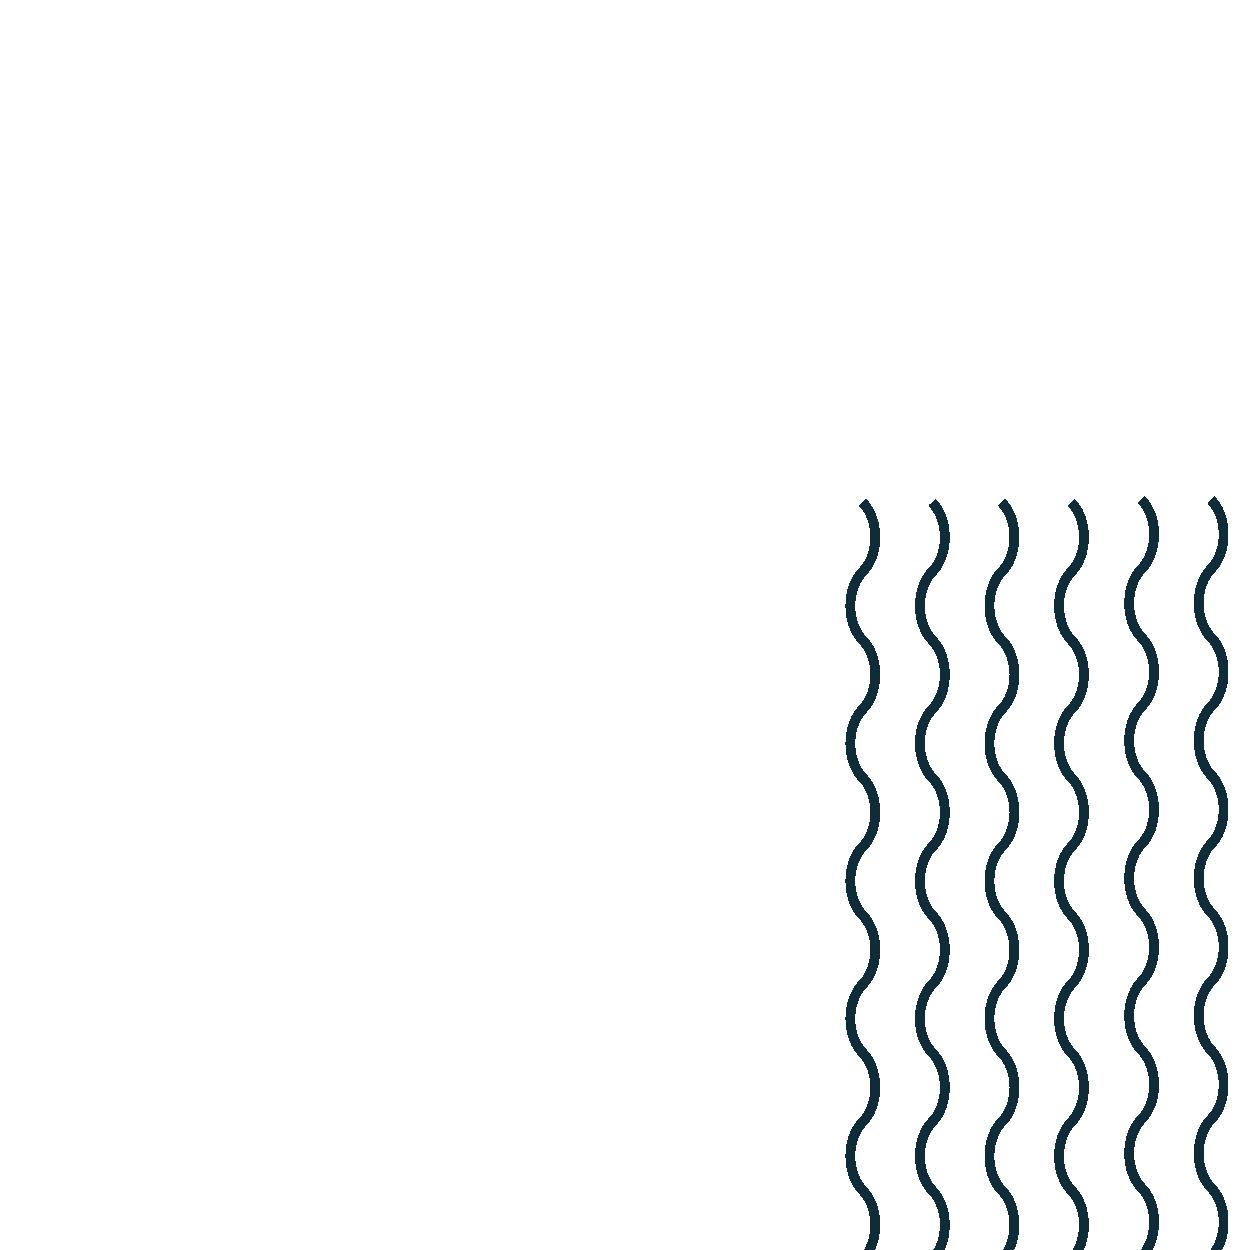 M/32 Terrace Homes | Shoreline Right Emblem